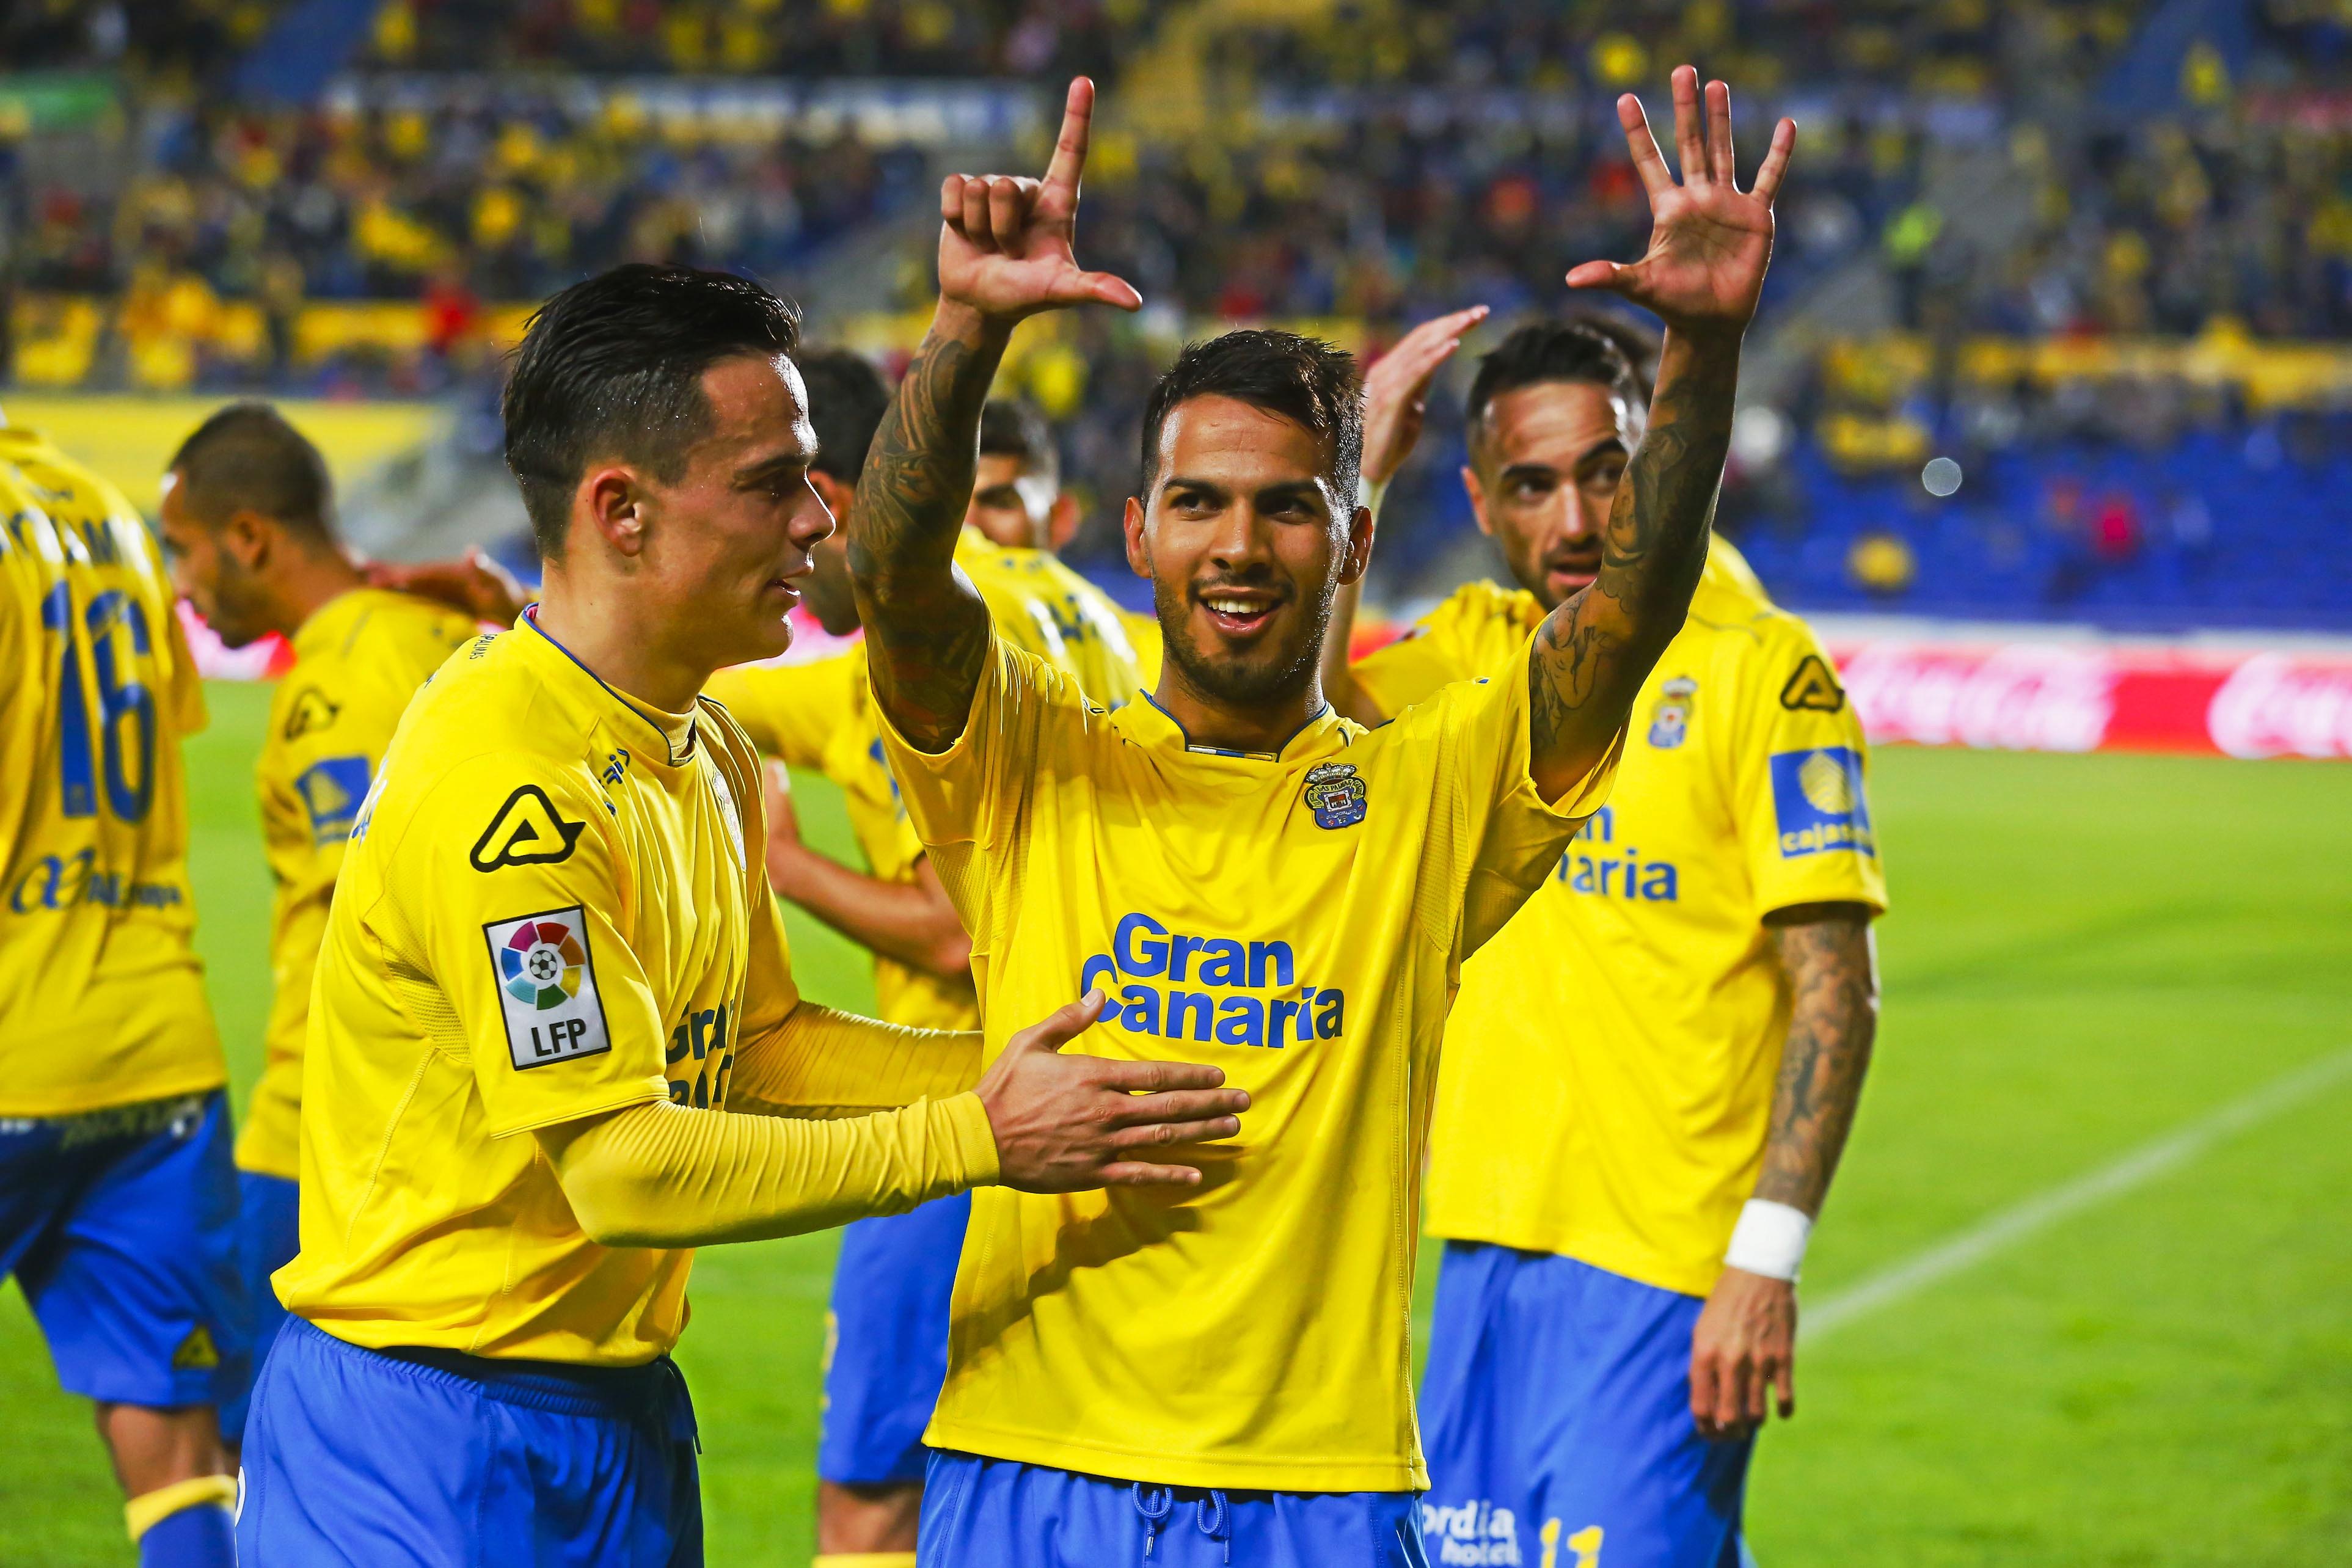 Partido de la Liga BBVA disputado entre Las Palmas y Getafe. En la imagen, Jonathan Viera celebra el segundo tanto.